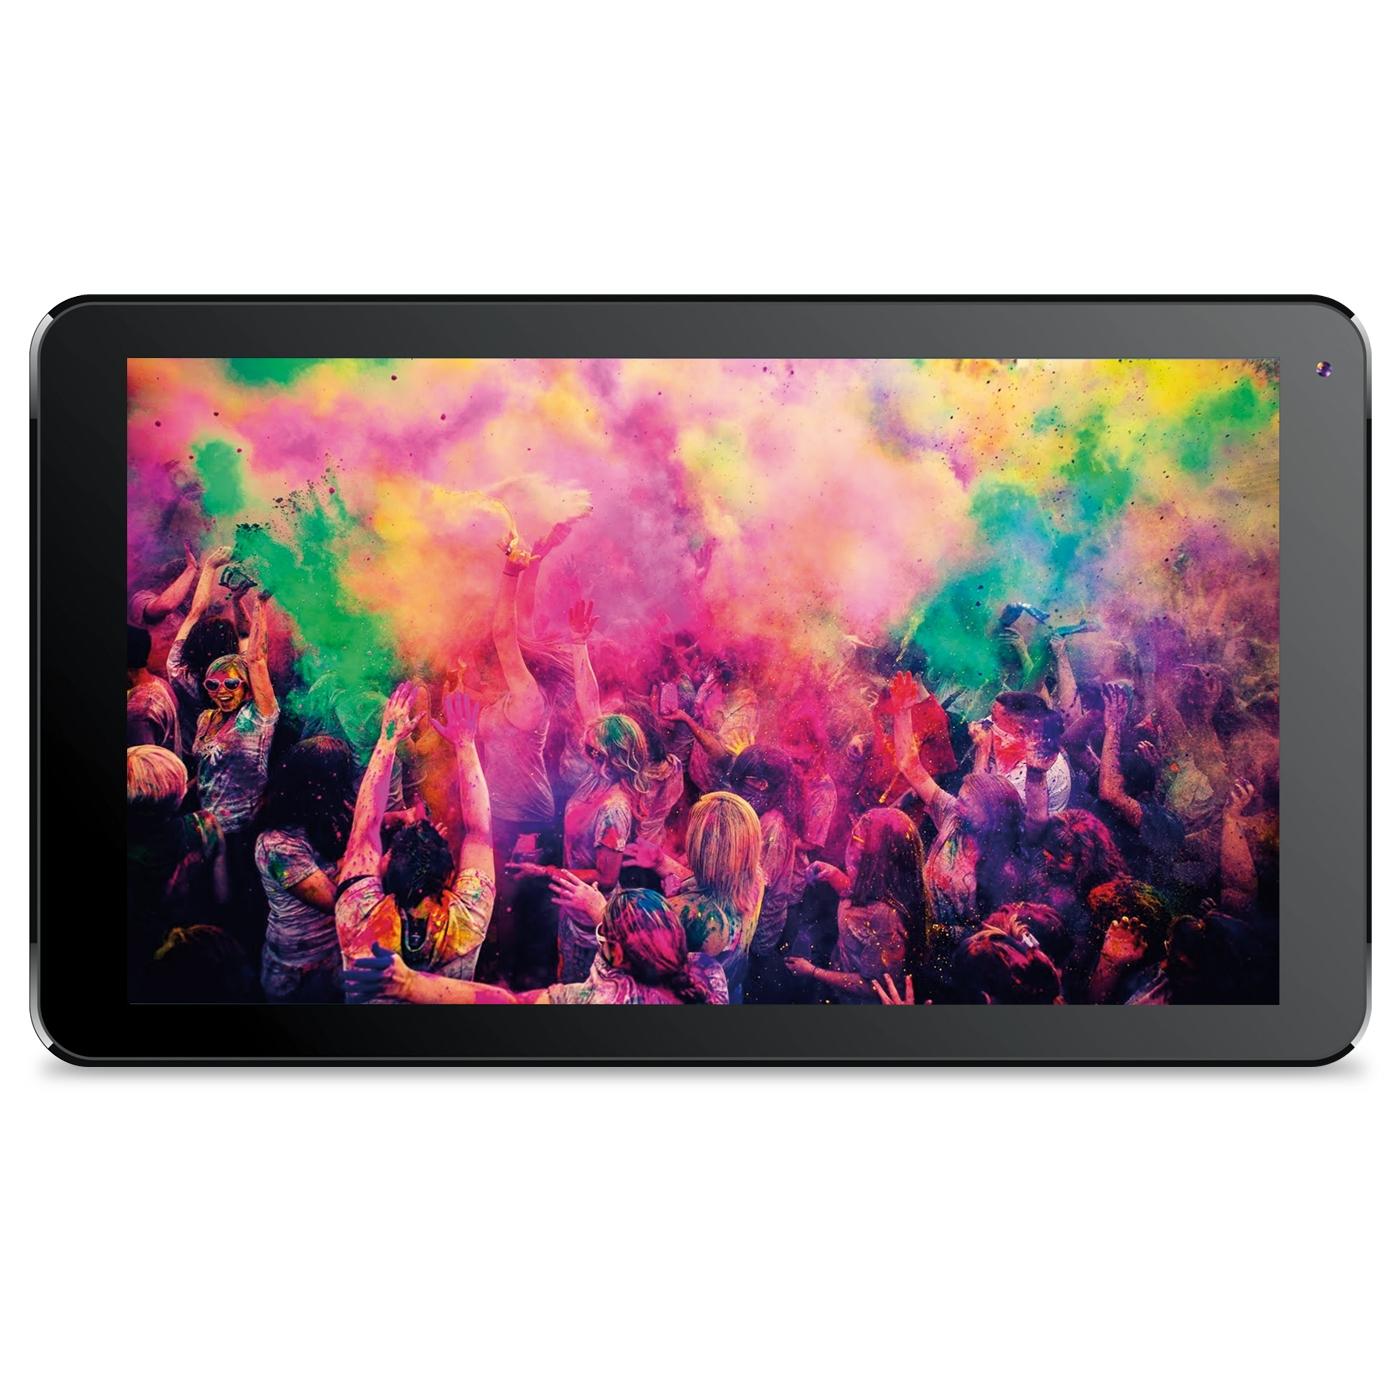 Tablet Pc Phoenix Lyratab10  /  Mtk8127 Quad Core /  1.3ghz   /  Lcd Capacitivo 10.1 Pulgadas 1024 X